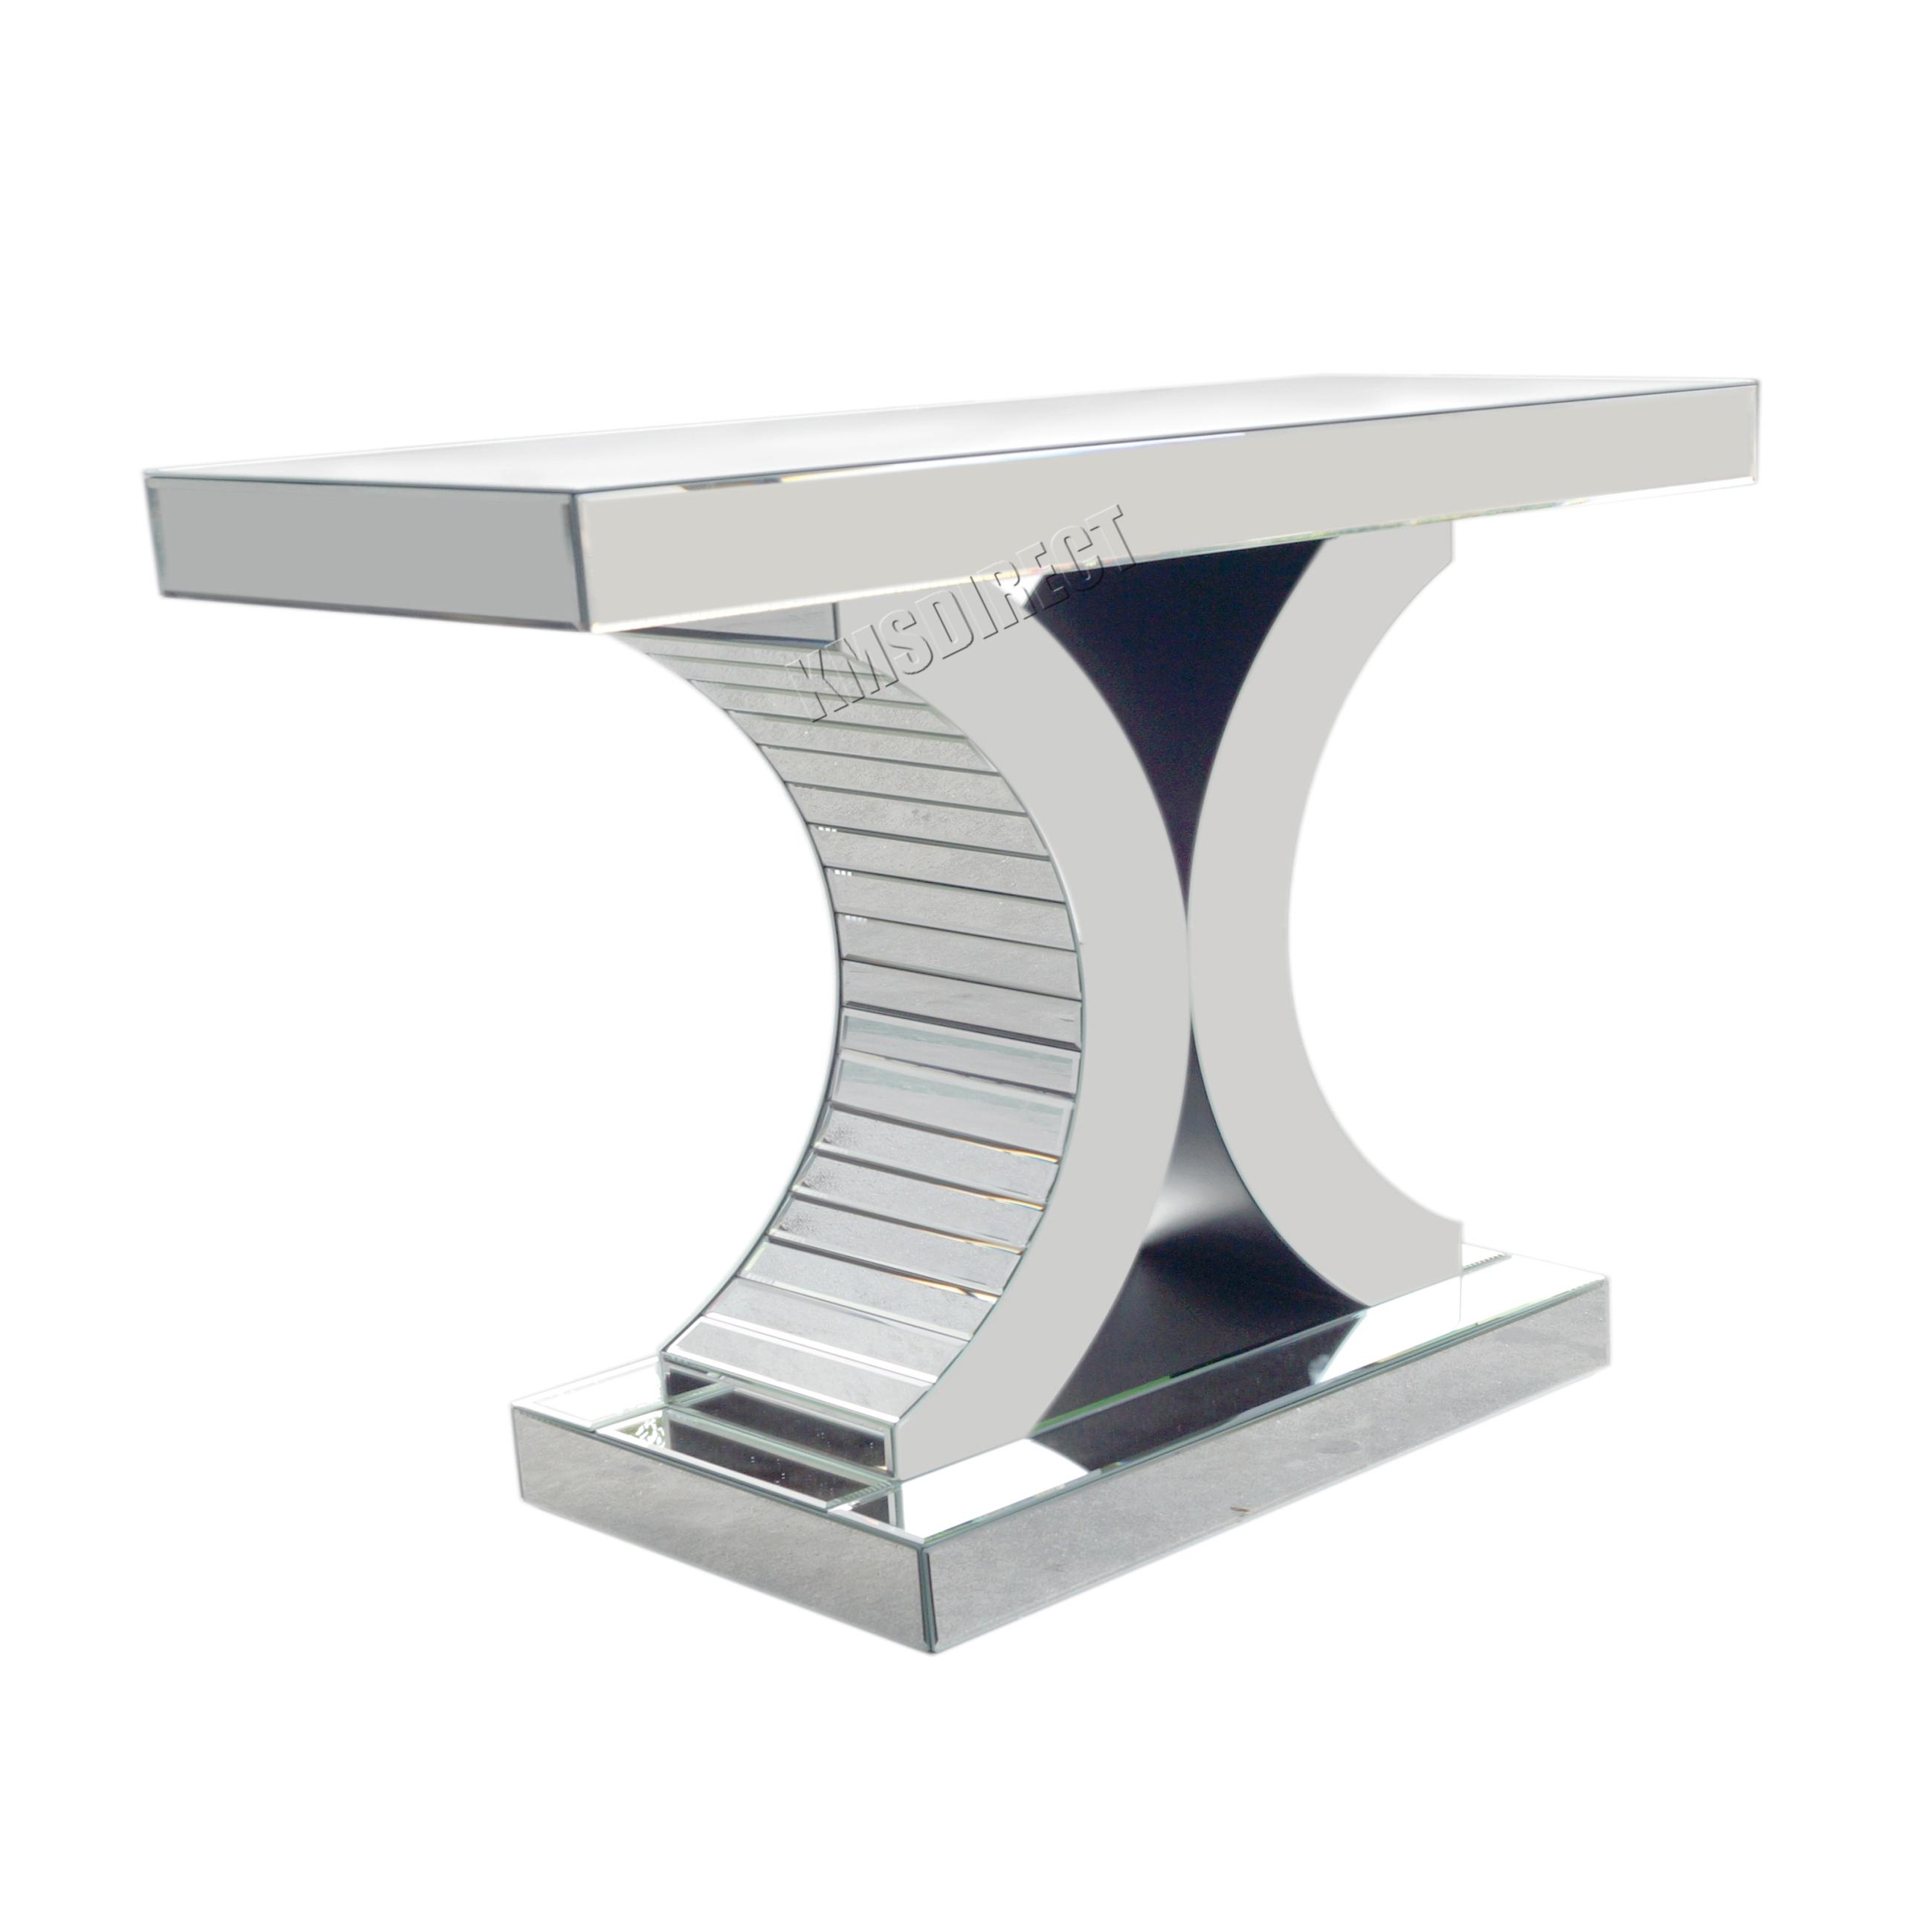 Foxhunter Mirrored Furniture Gl Table Console Desk Bedroom